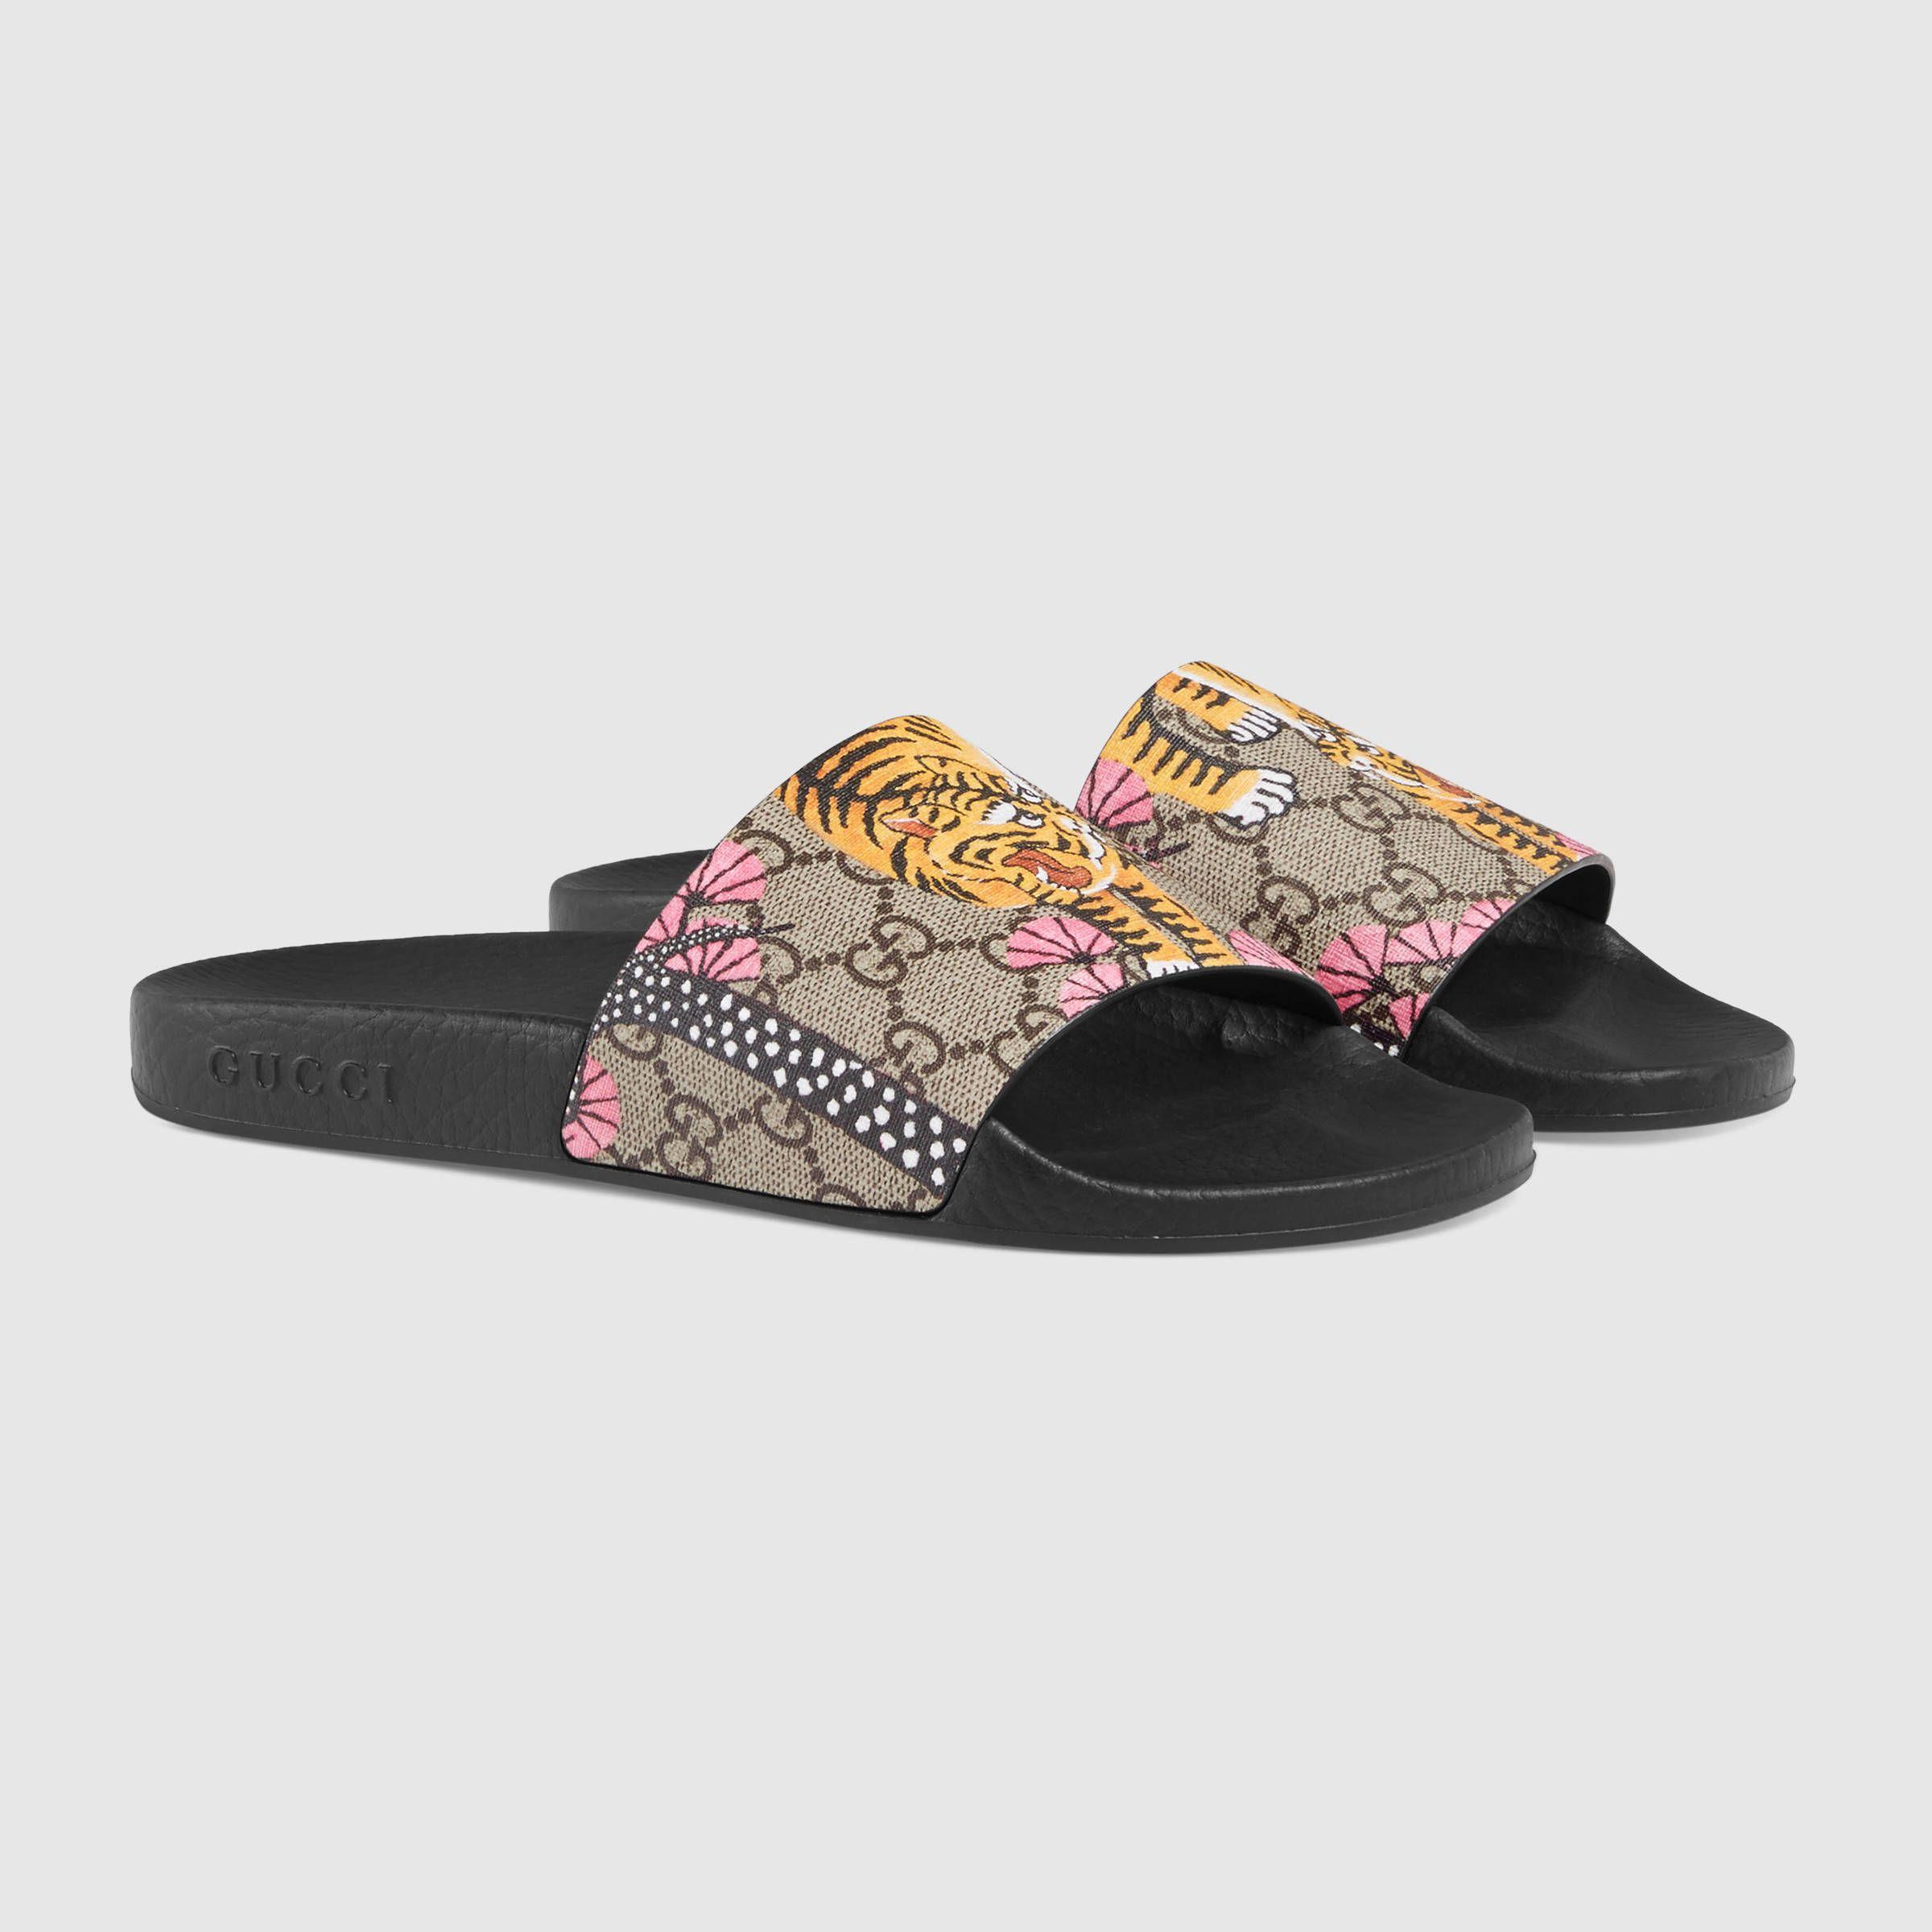 Gucci Bengal slide sandal - Gucci Women